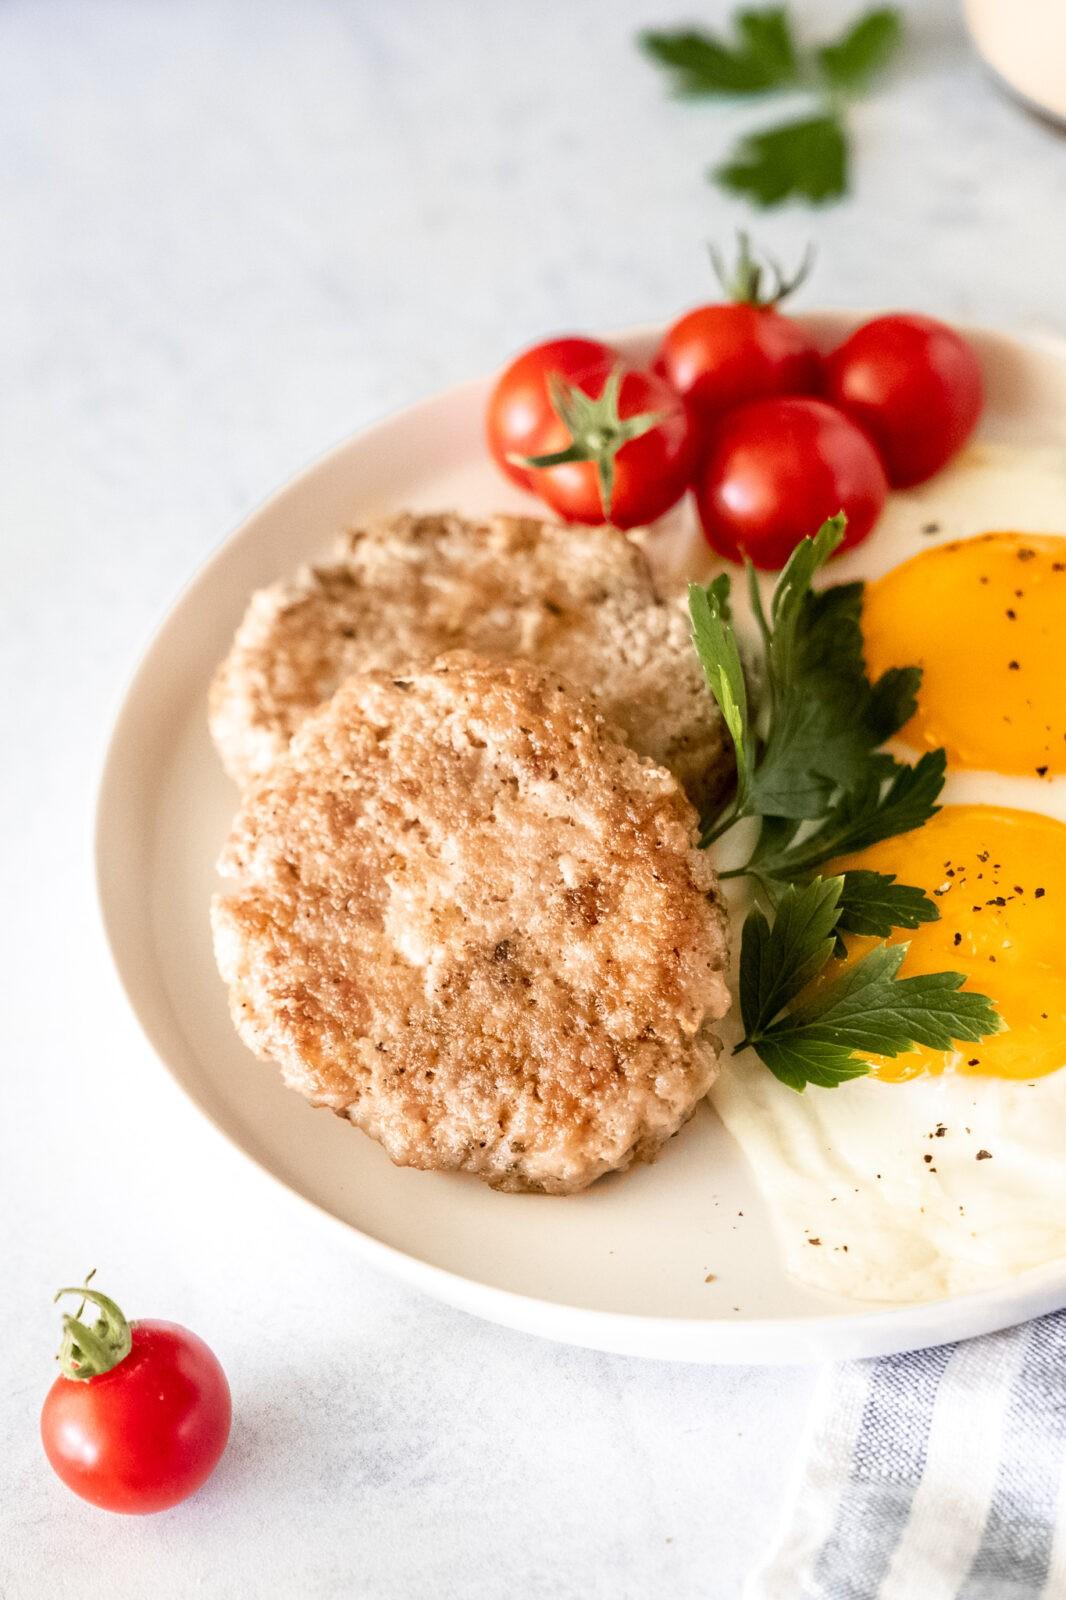 Homemade Country Breakfast Sausage Recipe